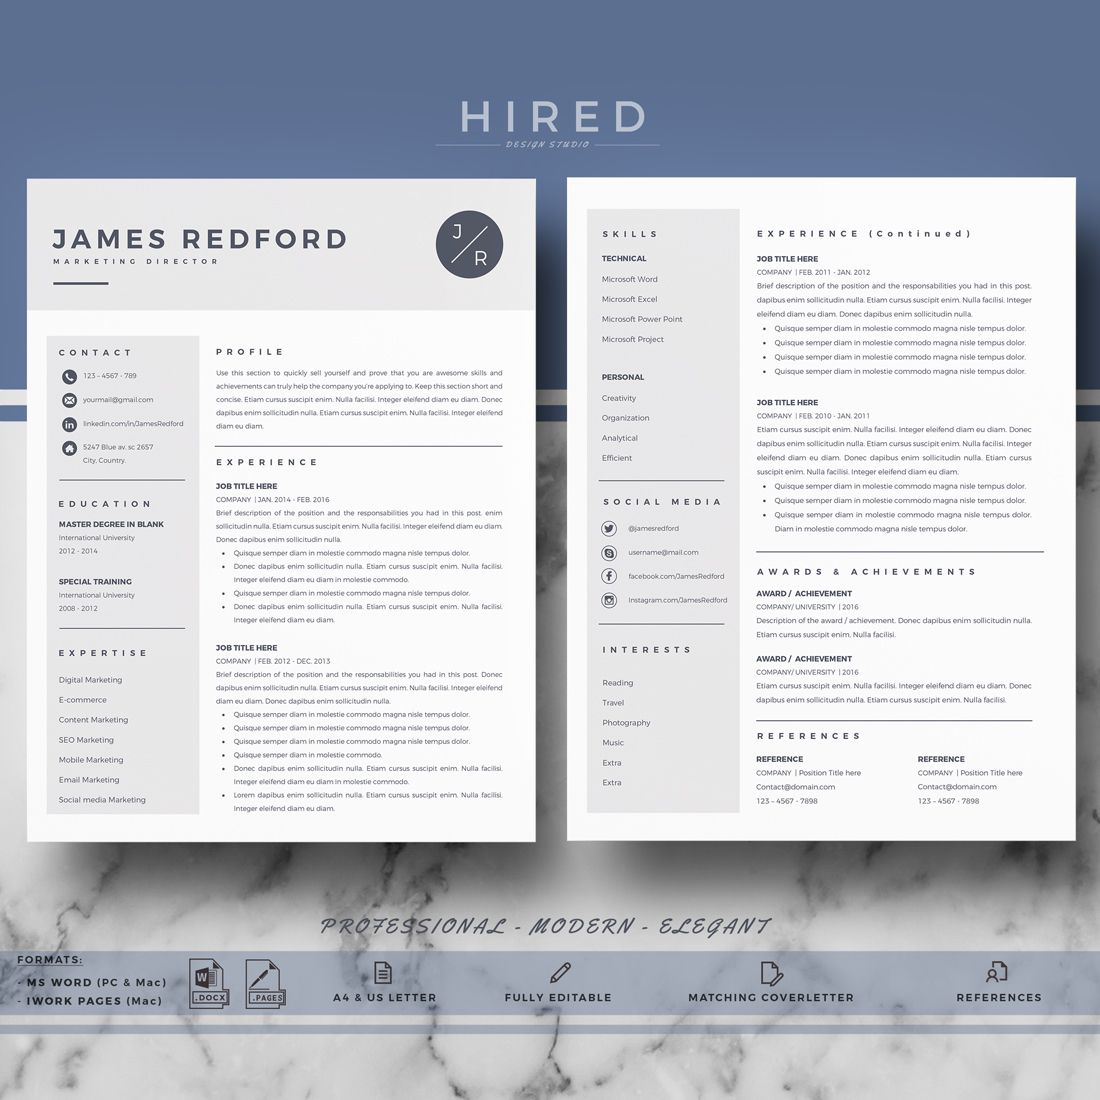 001 Phenomenal Word Resume Template Mac Design  2008 Microsoft 2011Full